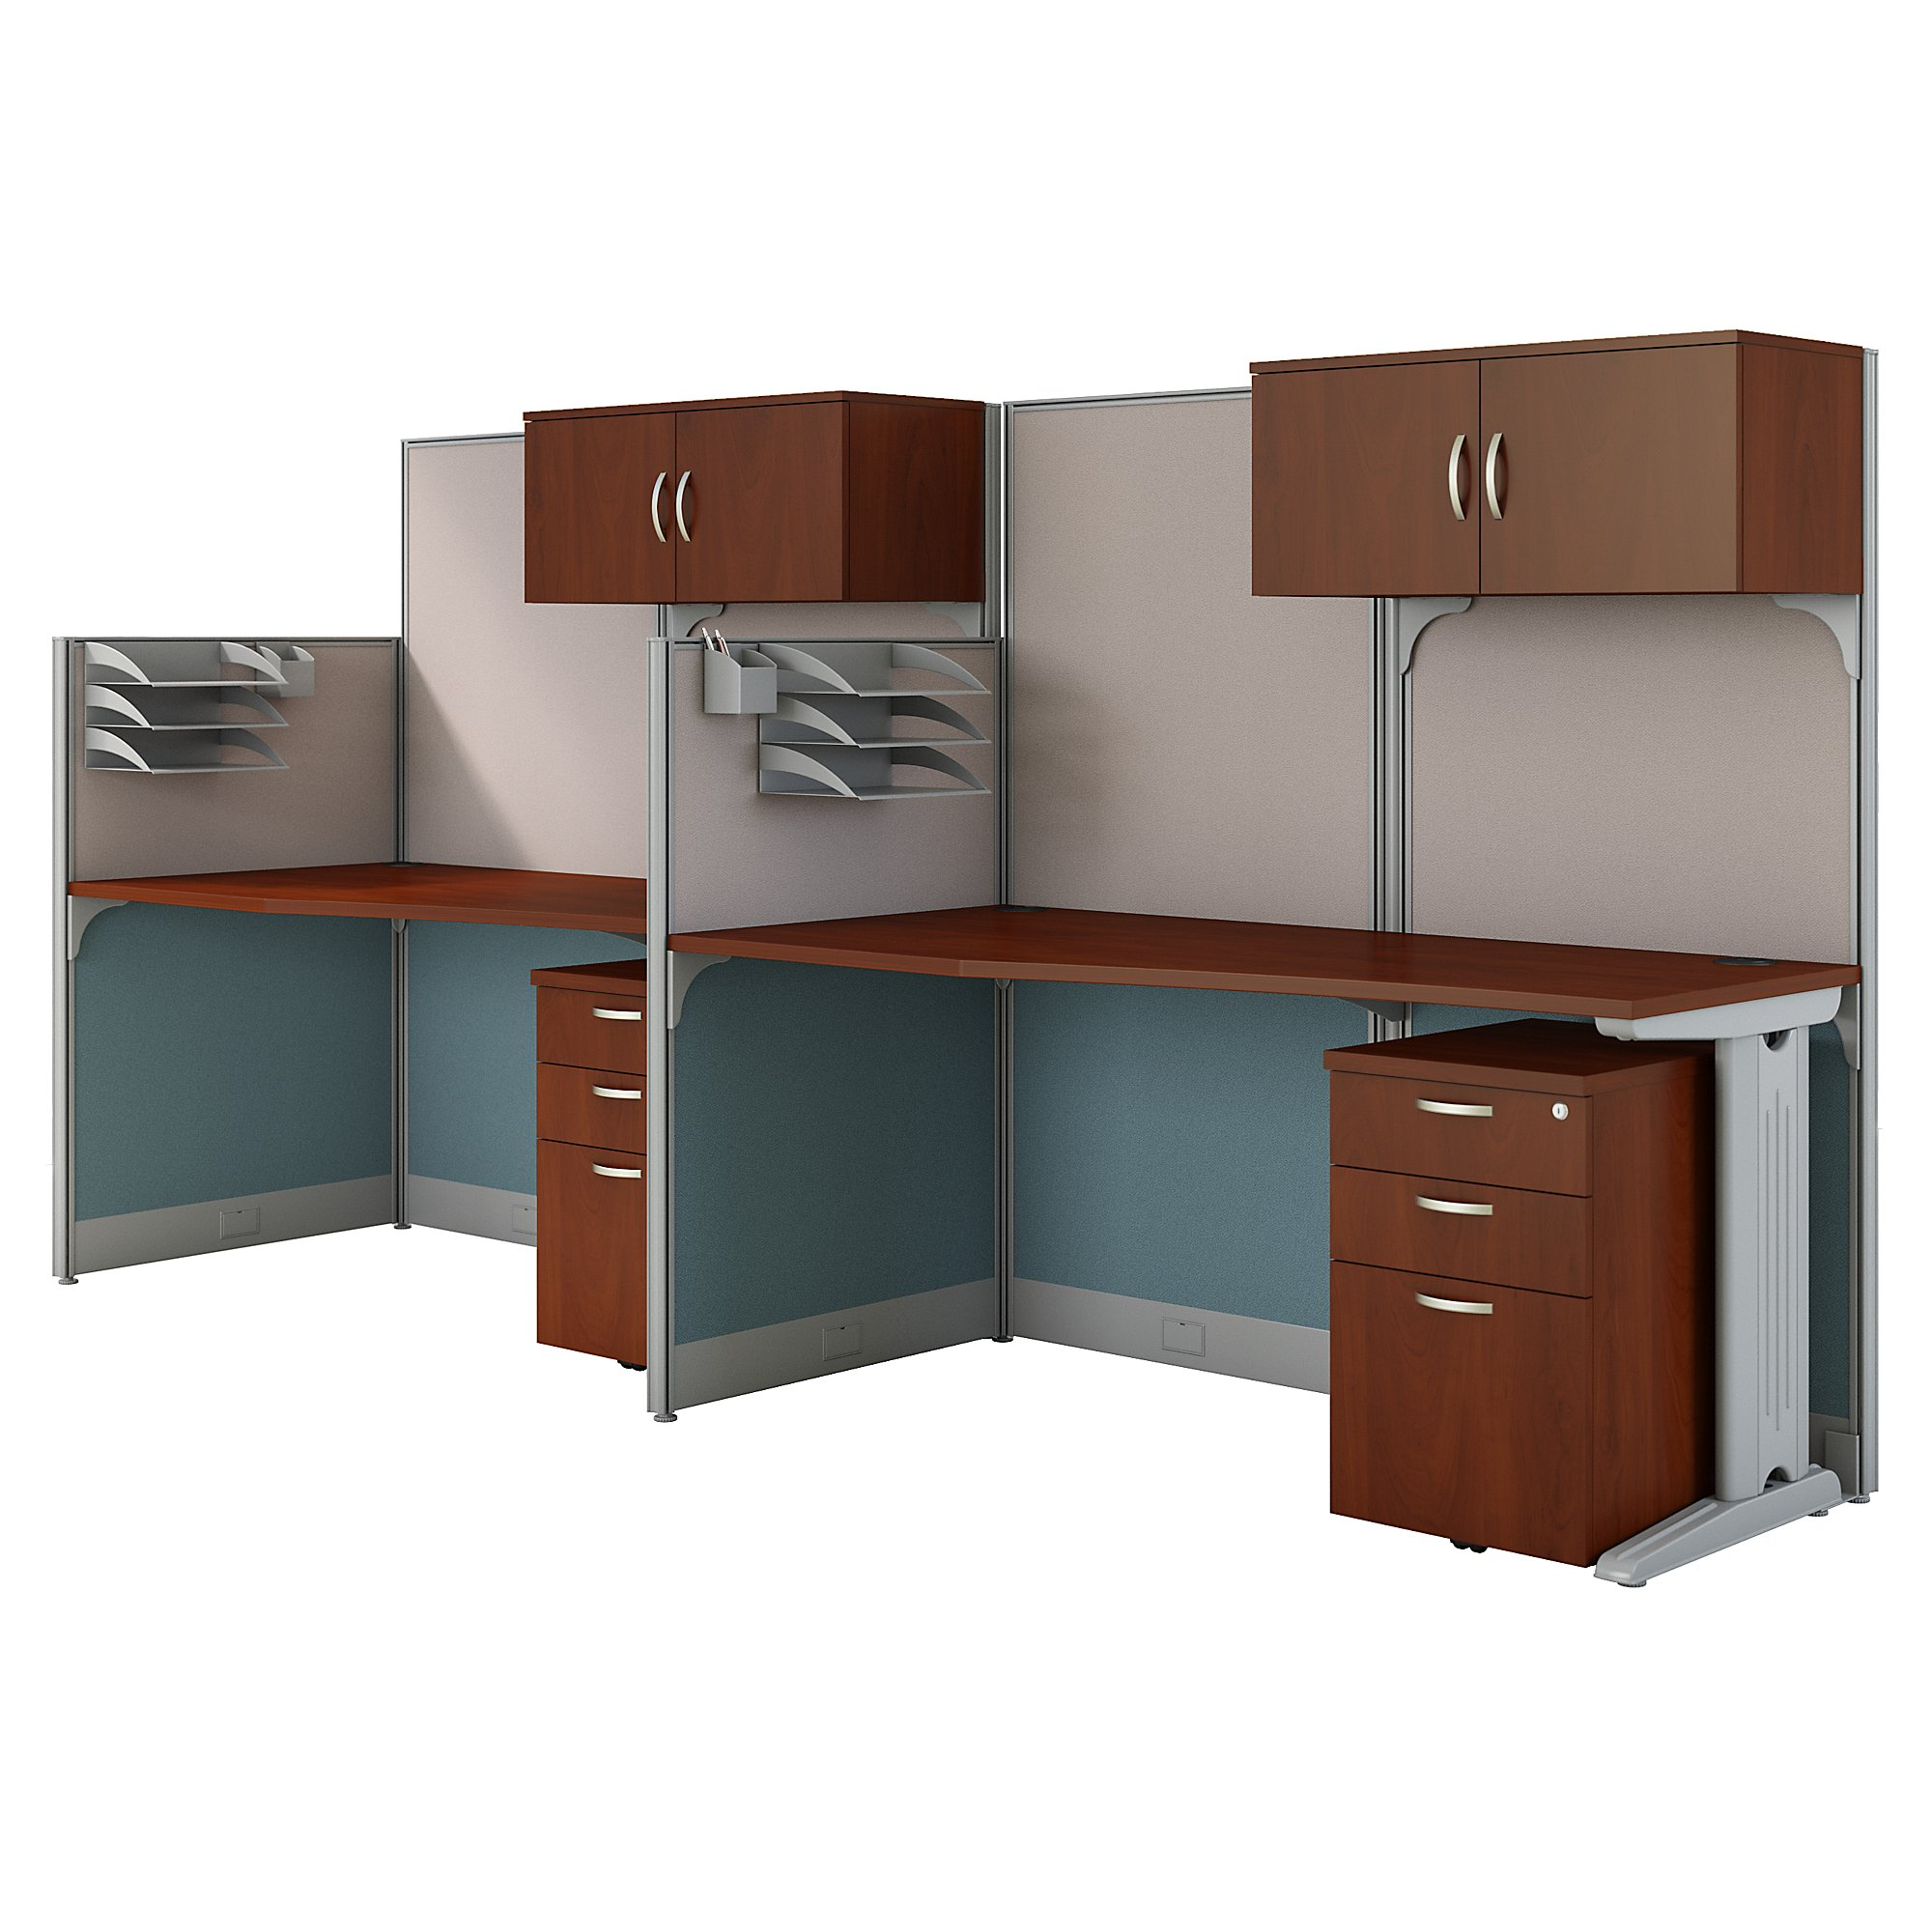 2 person modular workstation